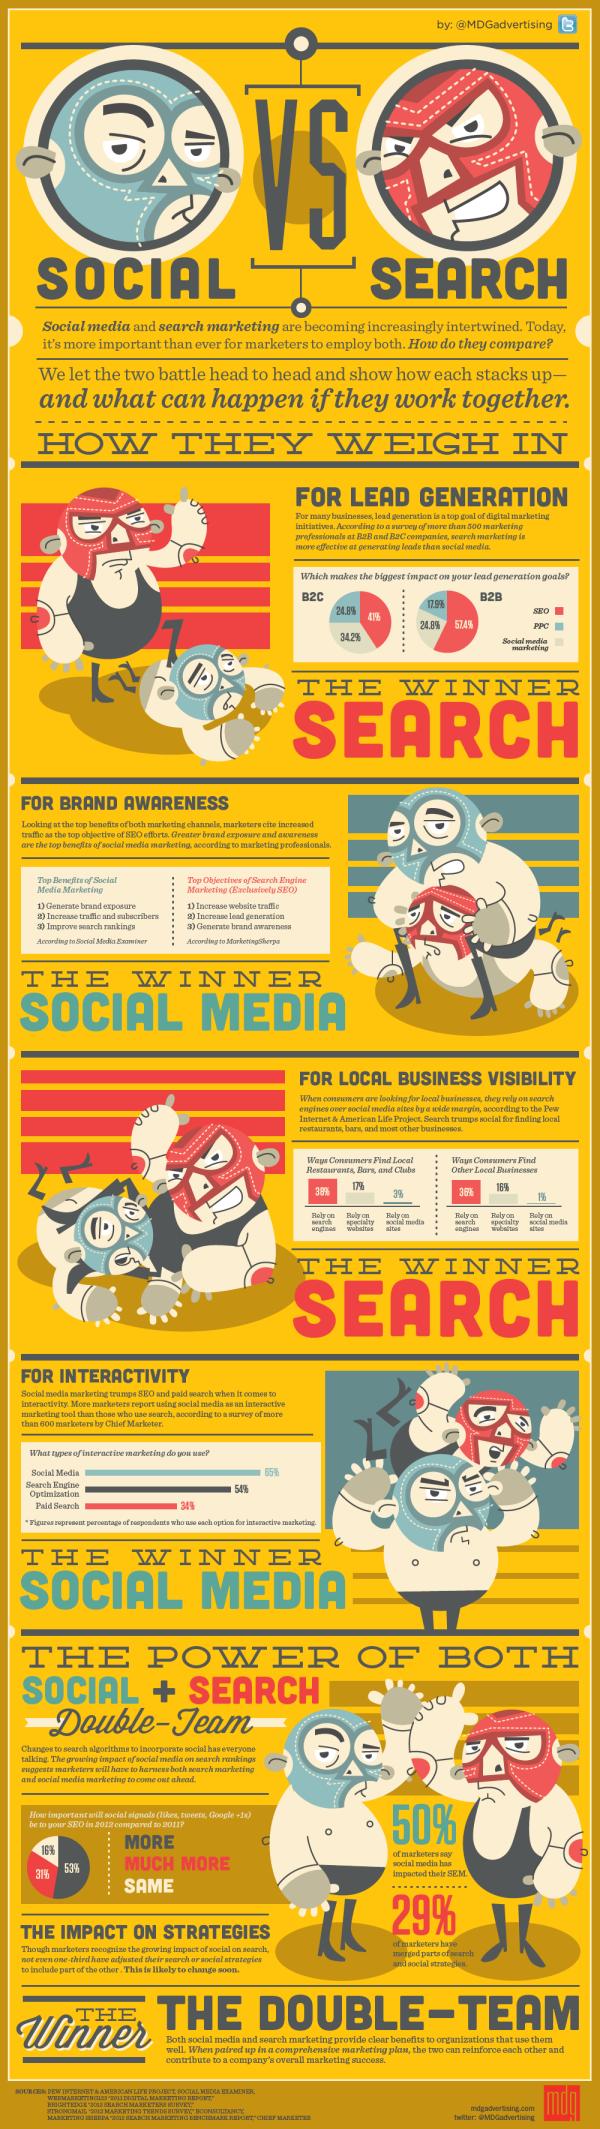 SEO versus Social Media resized 600